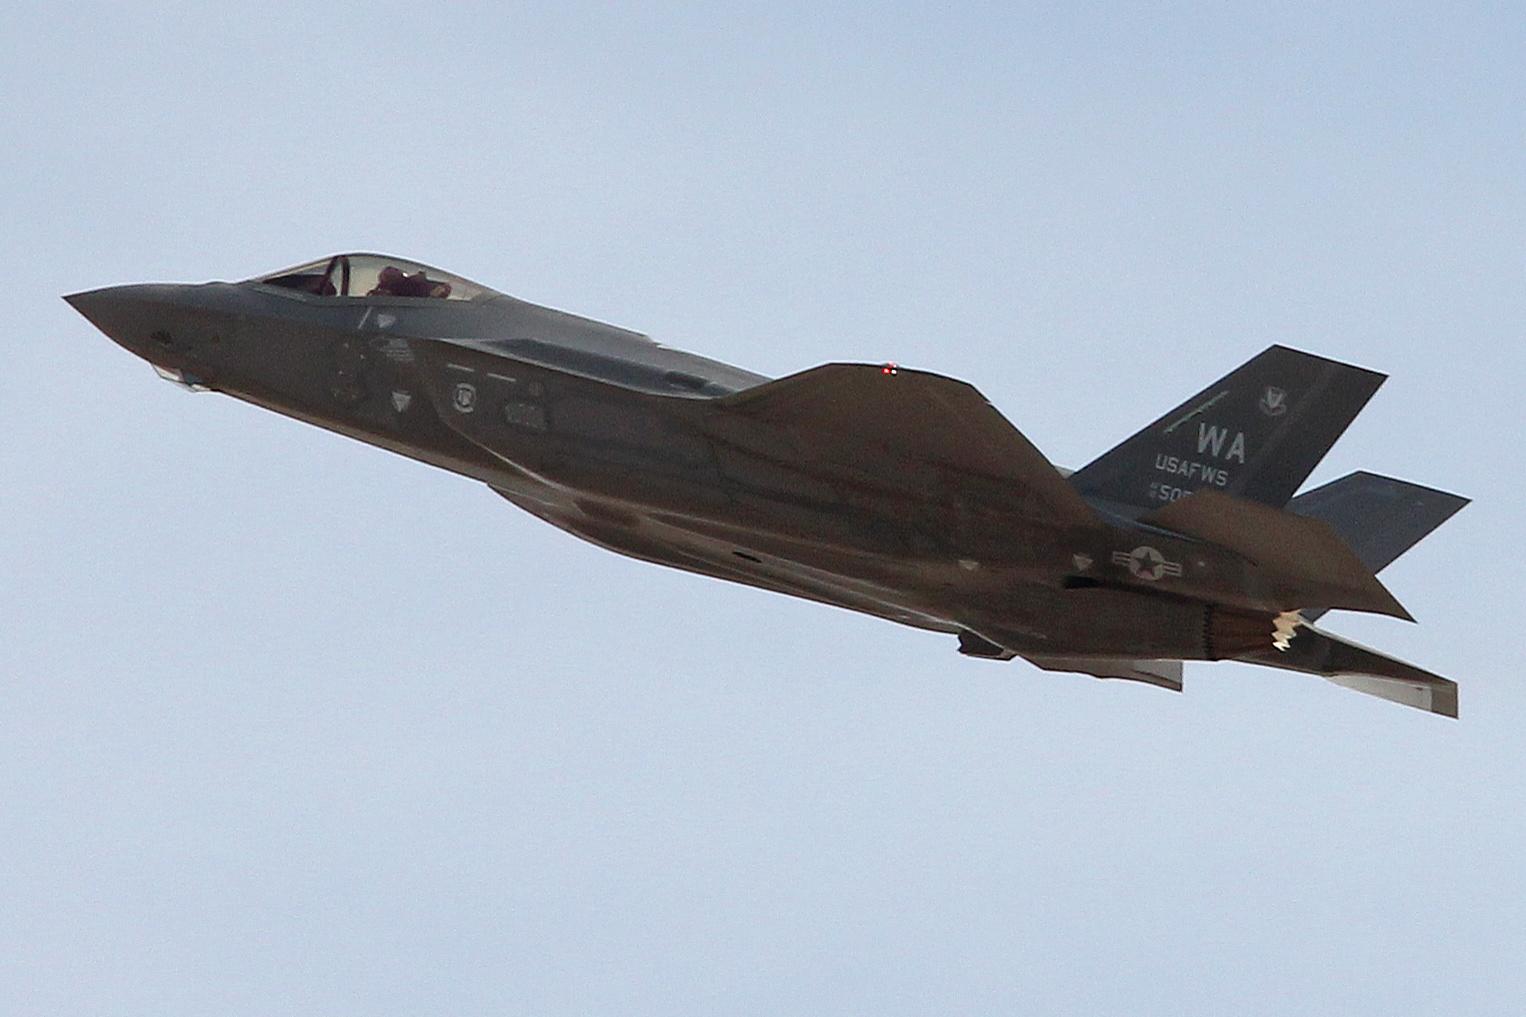 File:Lockheed-Martin F-35A Lightning II '12-5051 - WA' 'USAFWS' (28051205882).jpg - Wikimedia Commons